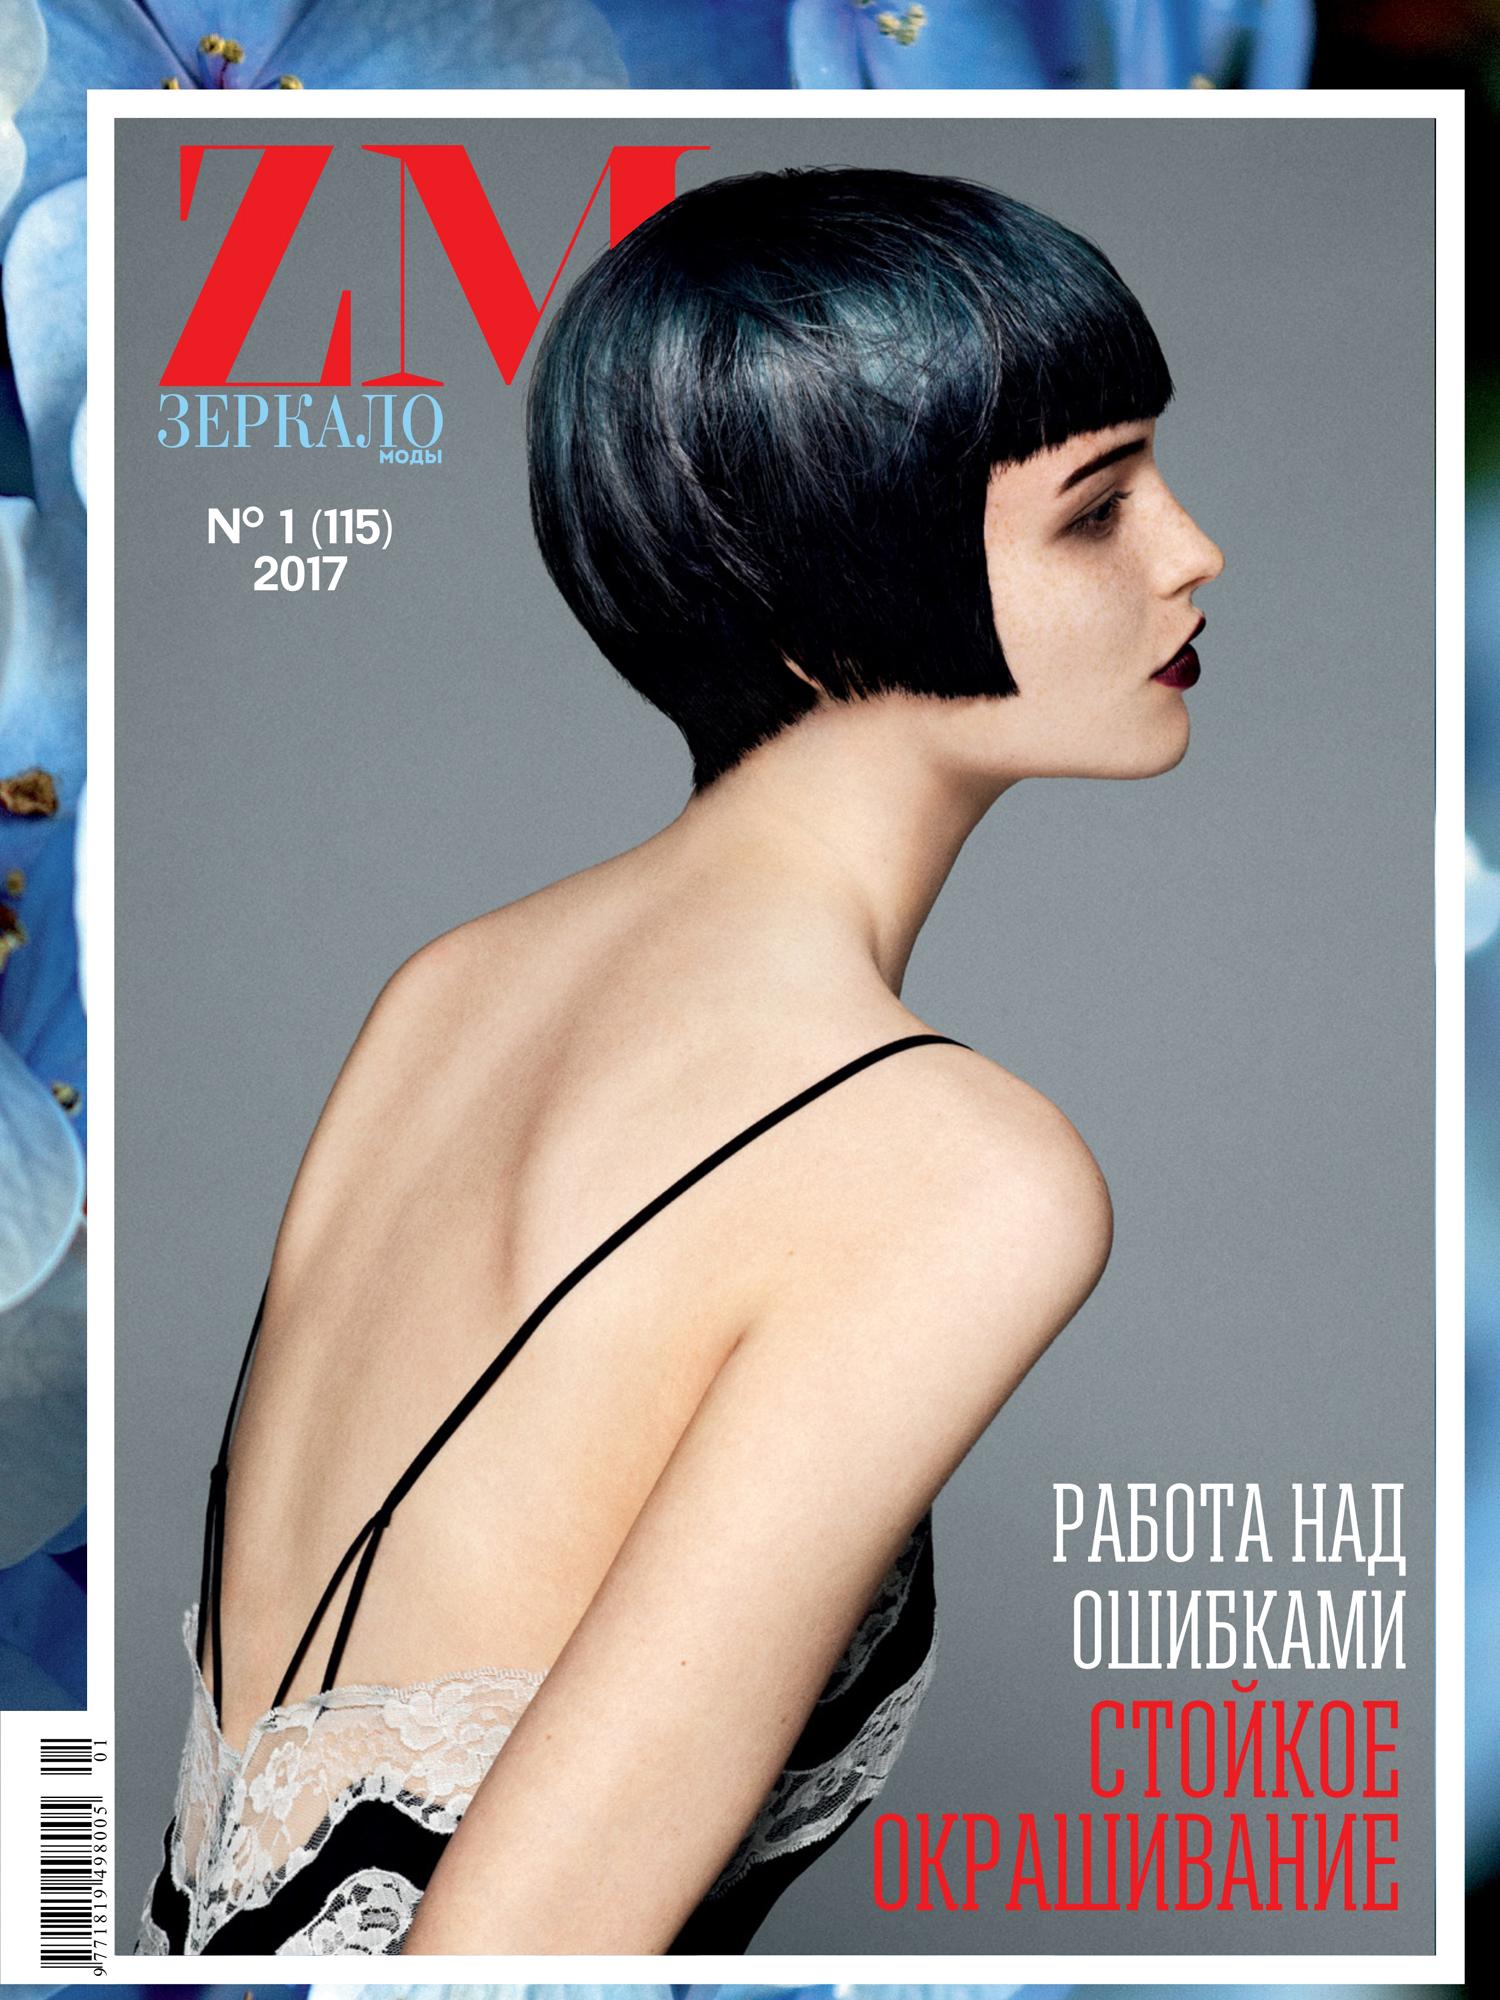 yoshikohair_stkilda_melbourne_hairdresser_hairsalon_zm17_cover